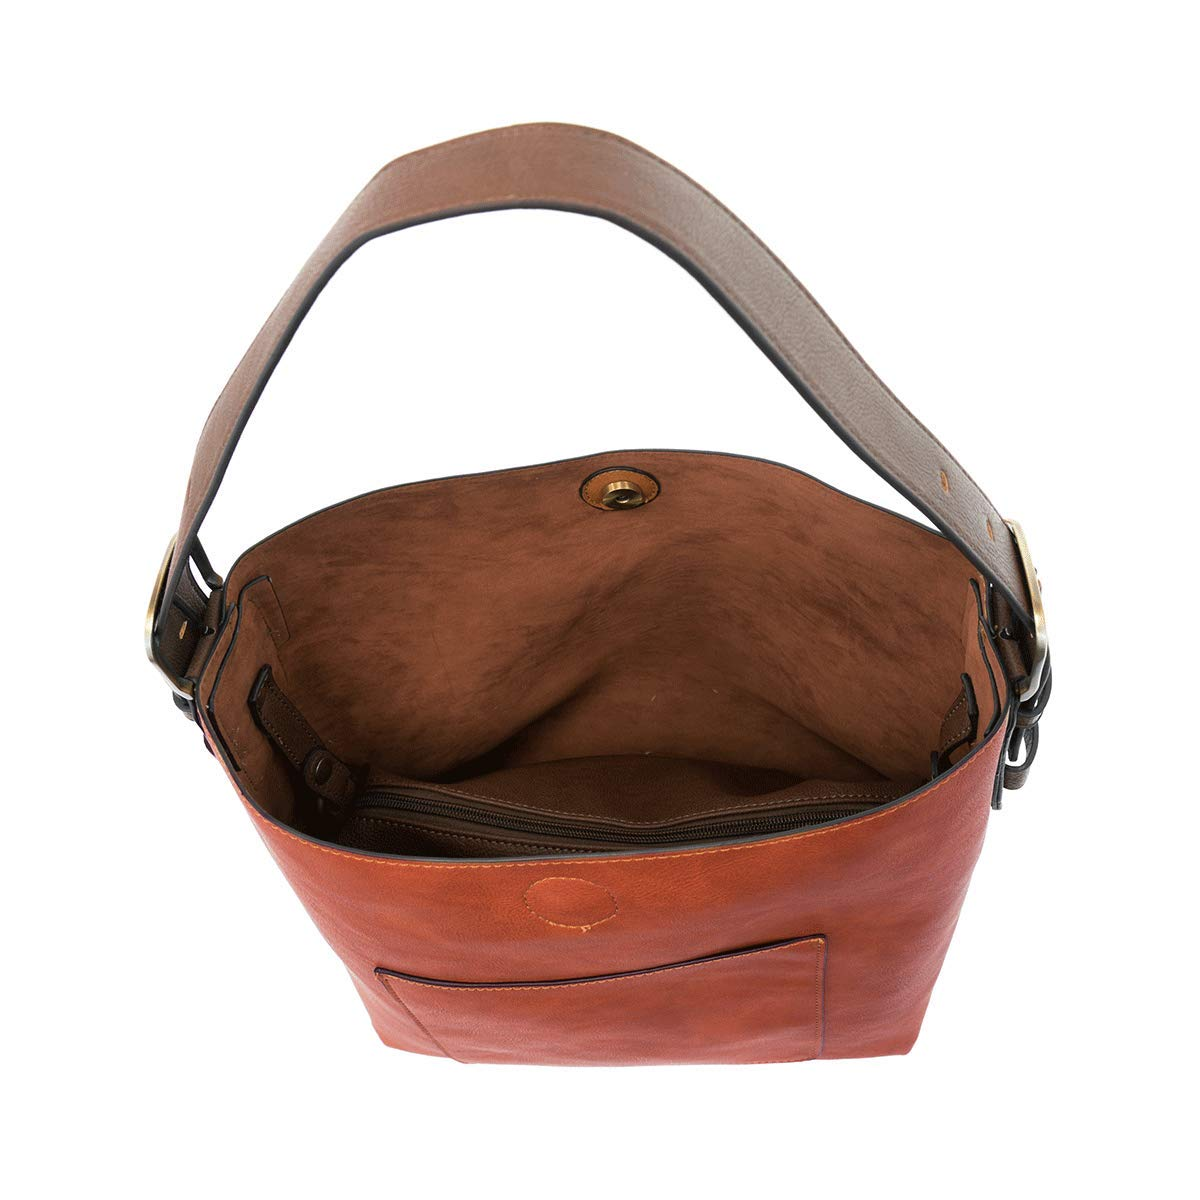 Joy Susan klassisk hobo handväska Russet